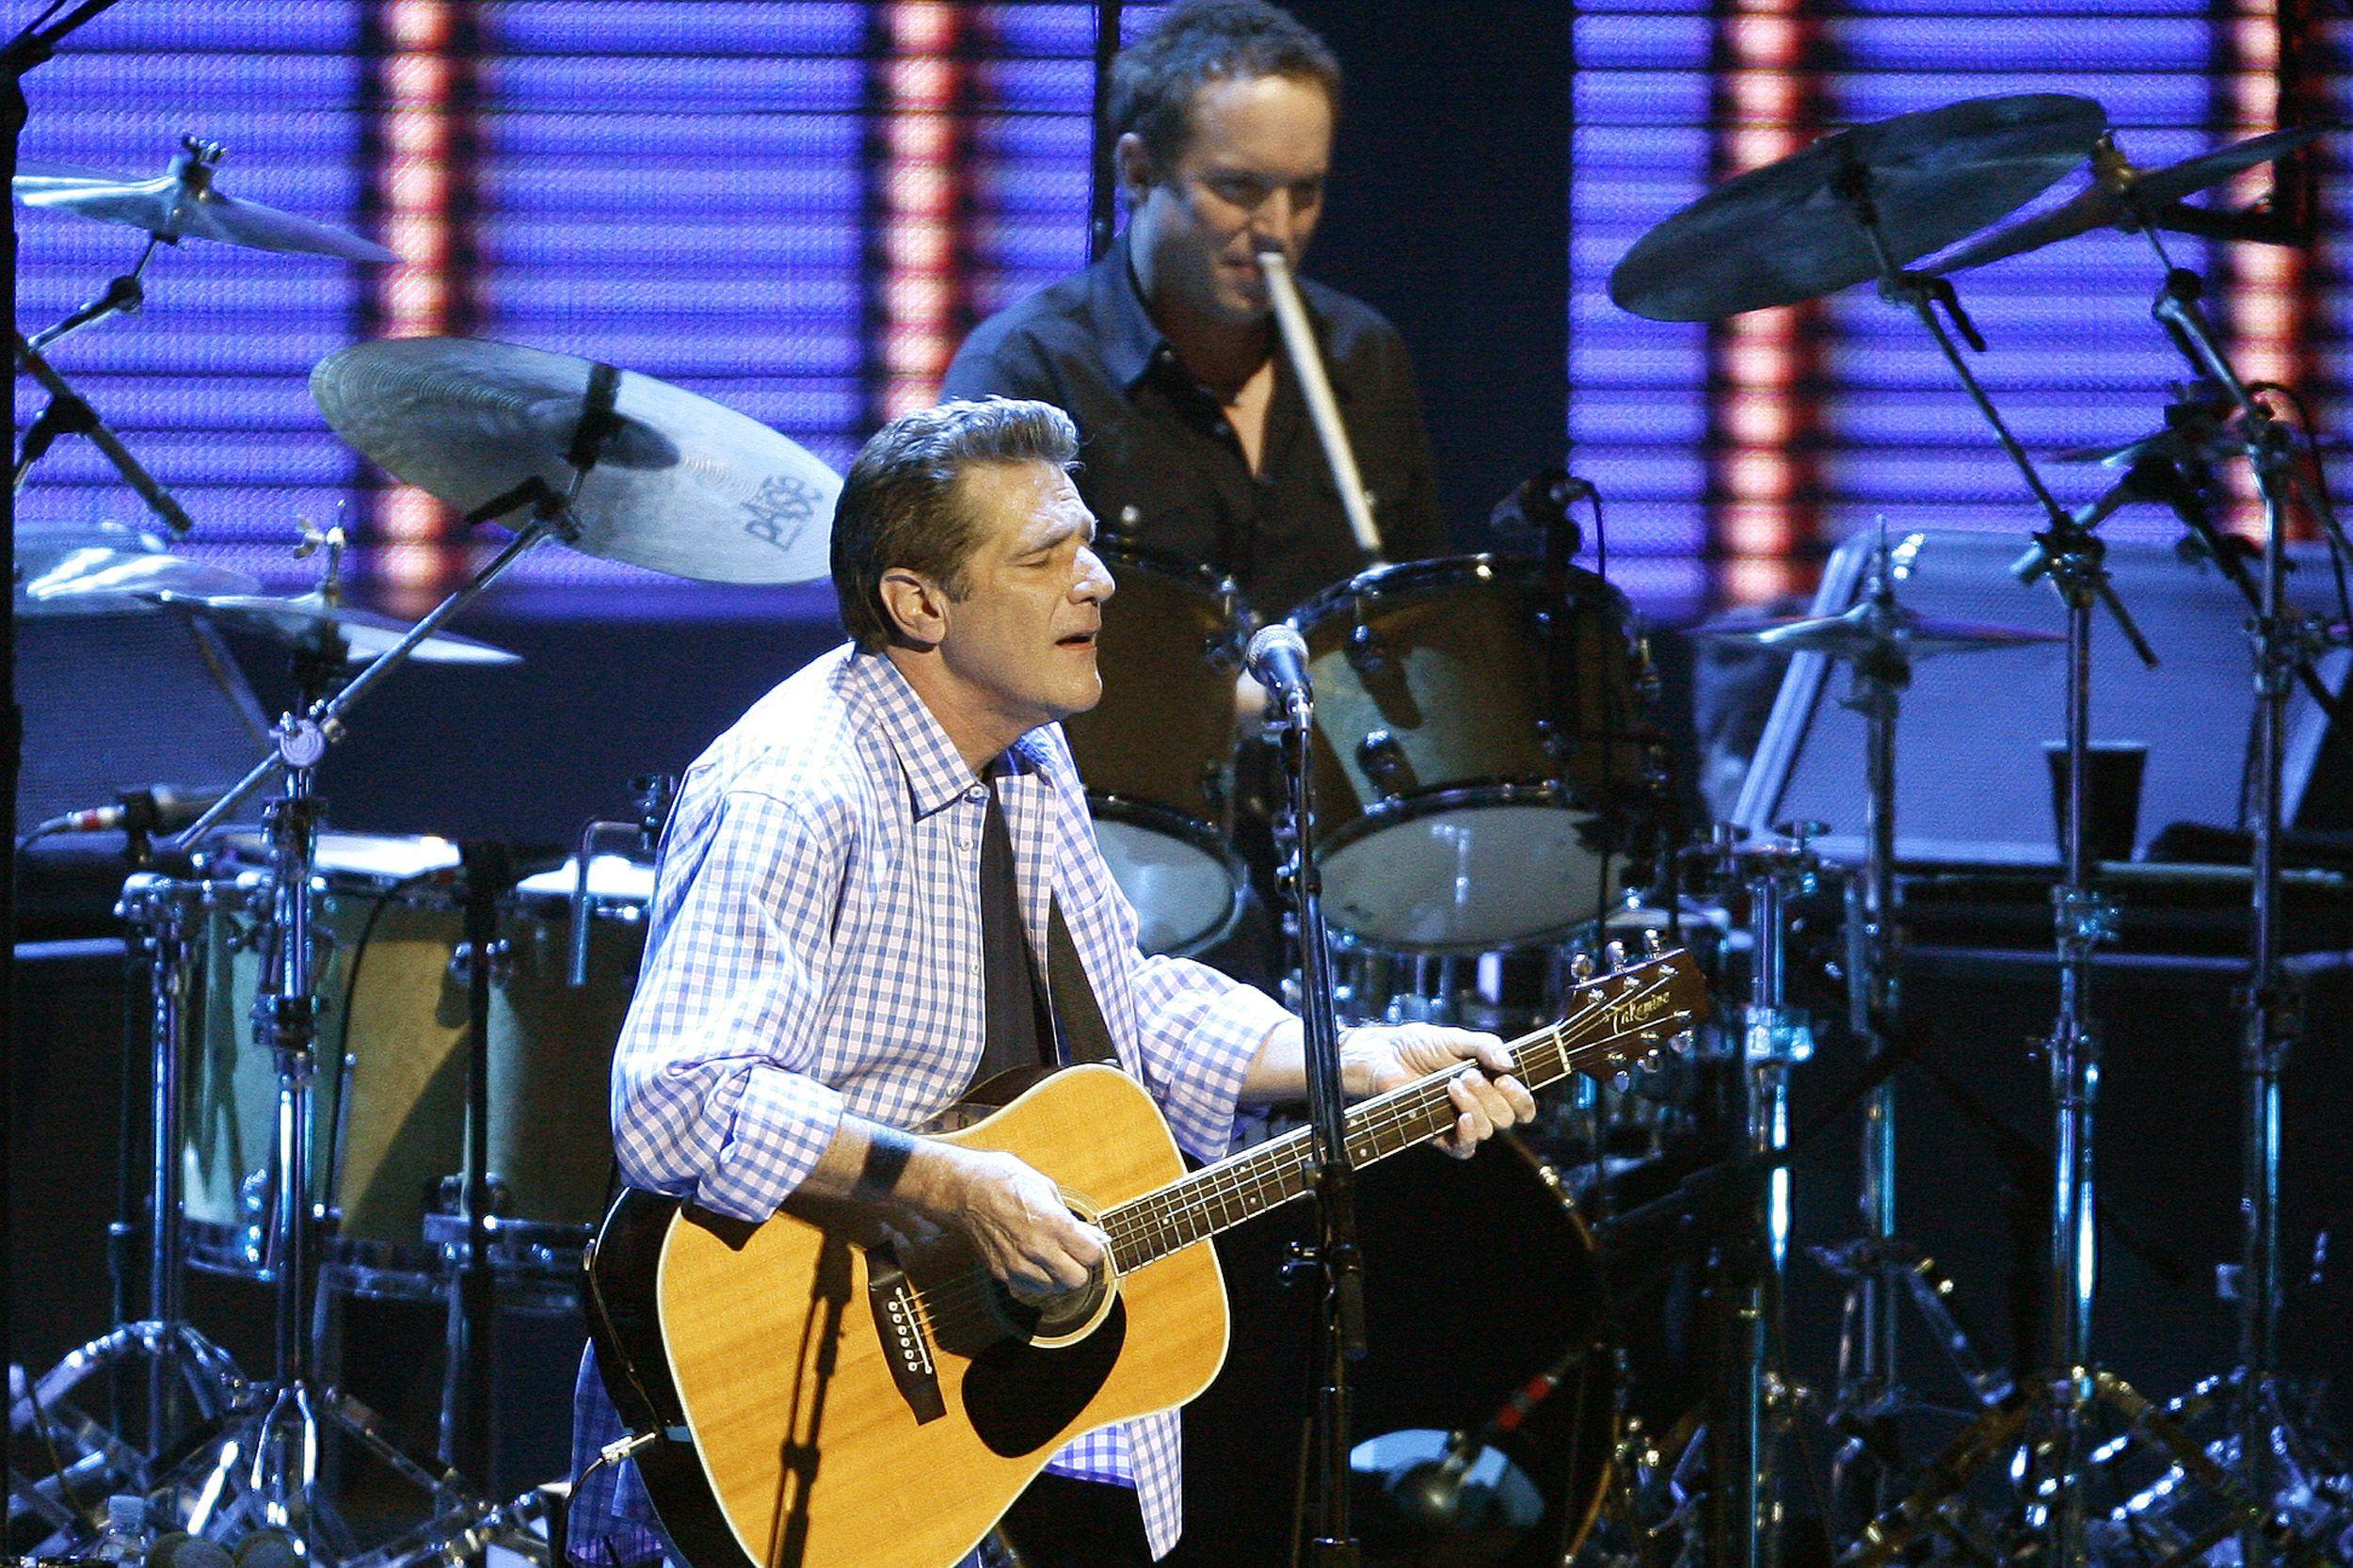 Morreu Glenn Frey, guitarrista dos Eagles